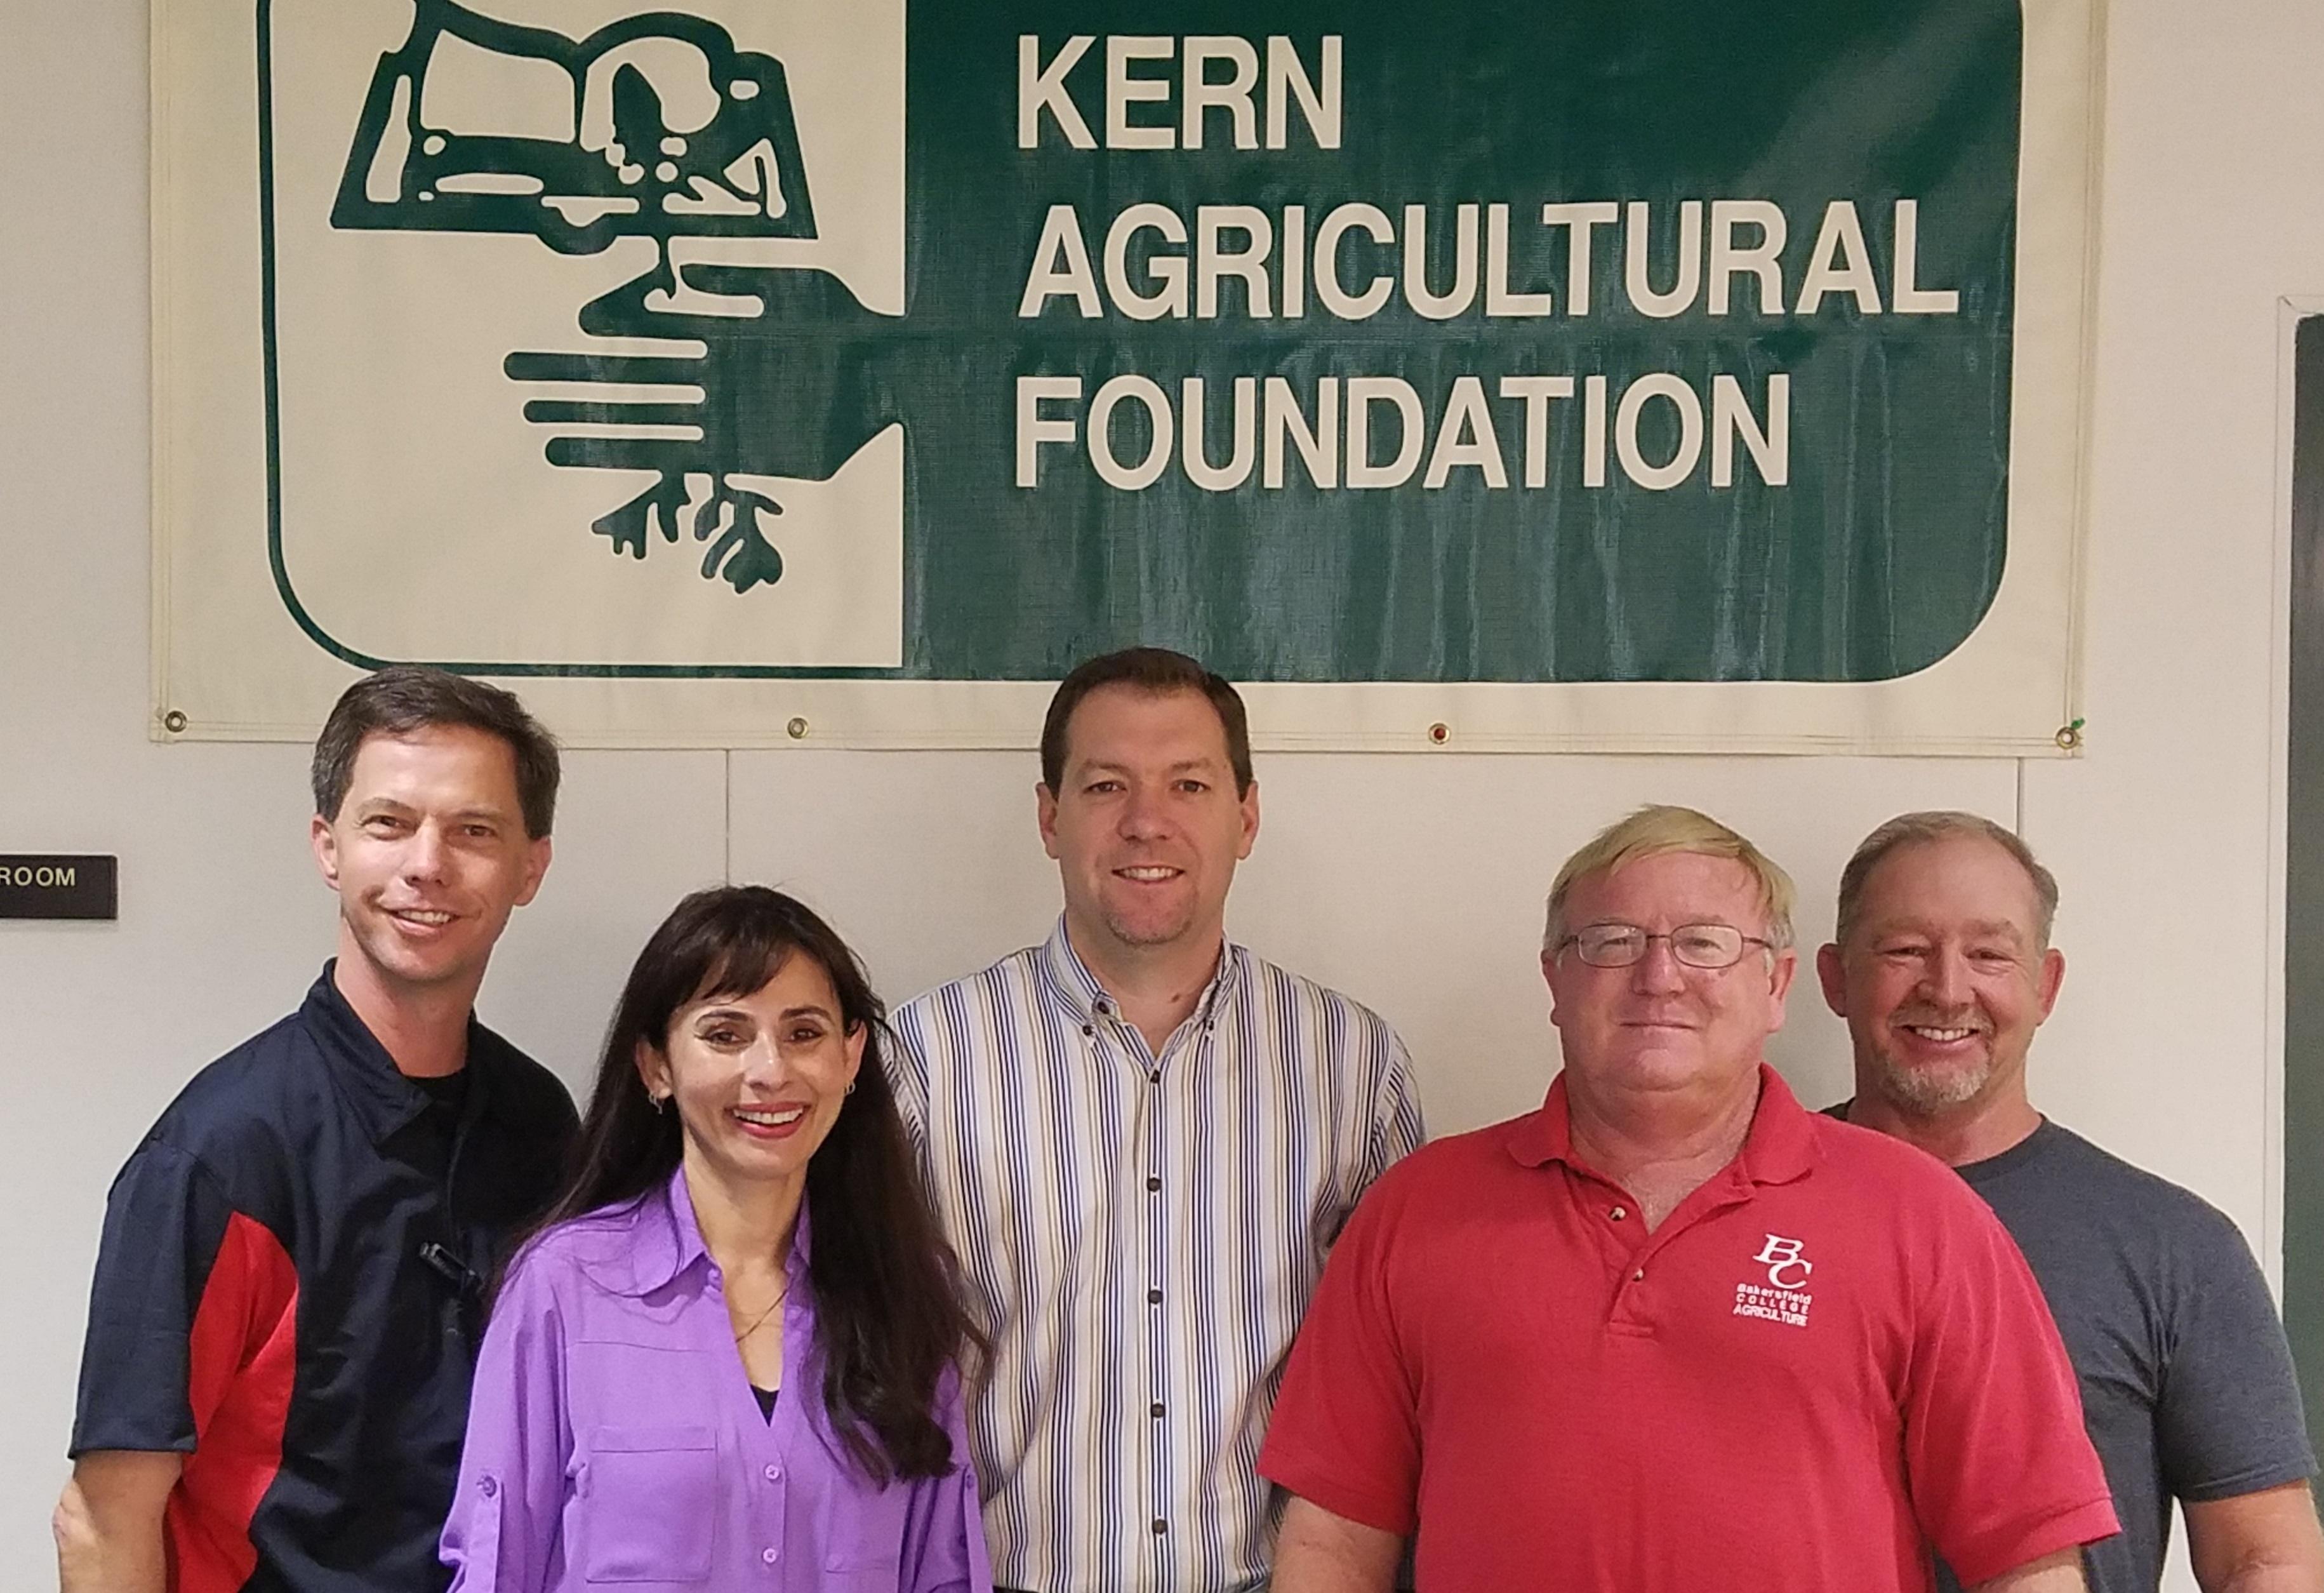 kern-ag-foundation-sep-21-2016